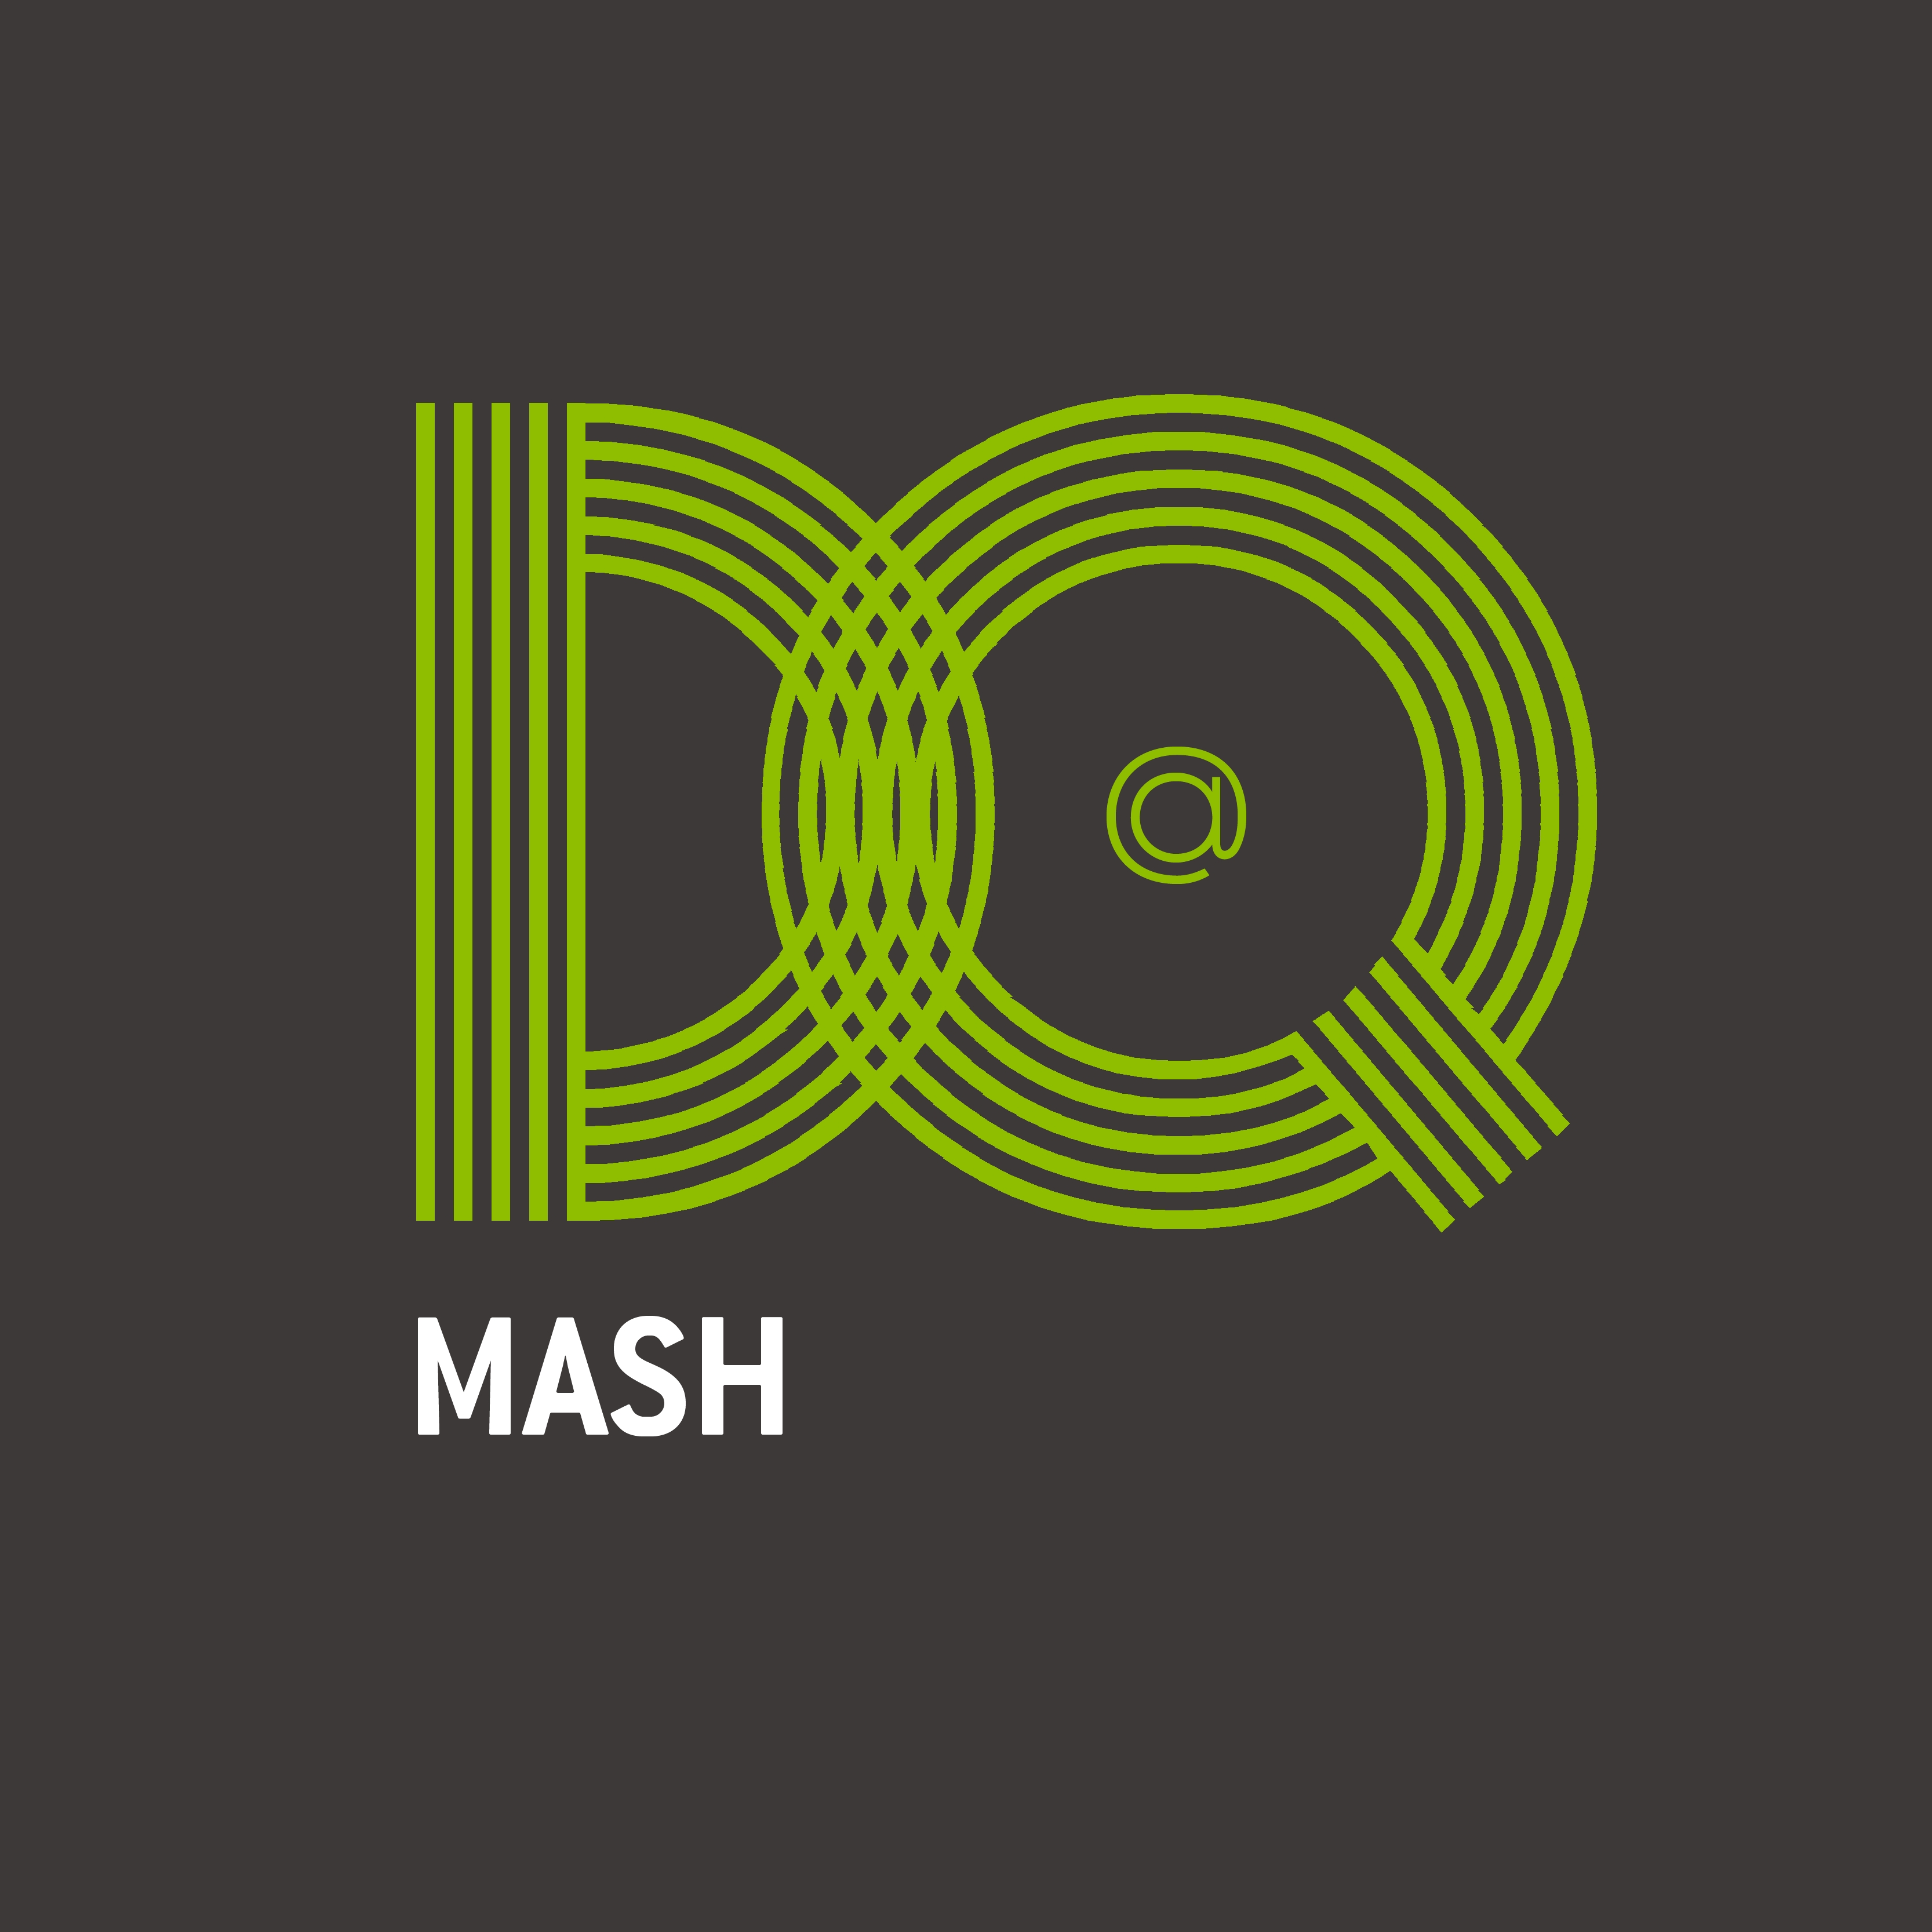 12. DQ - MASH